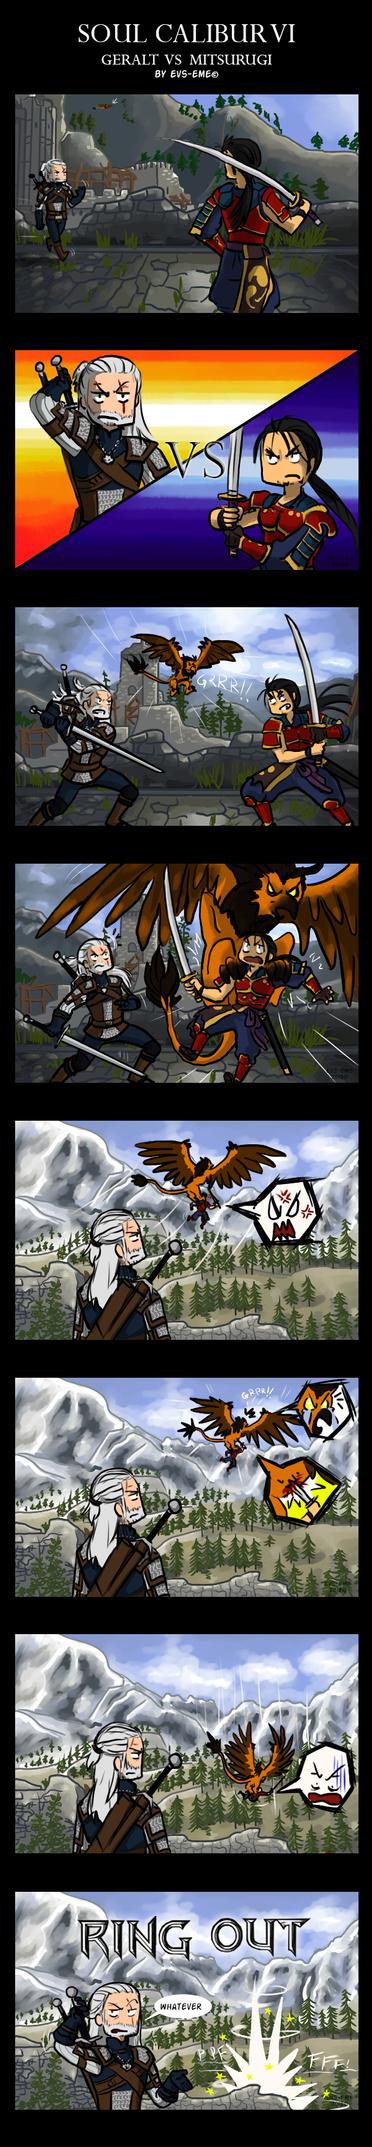 SCVI comic - Geralt VS Mitsurugi by evs-eme